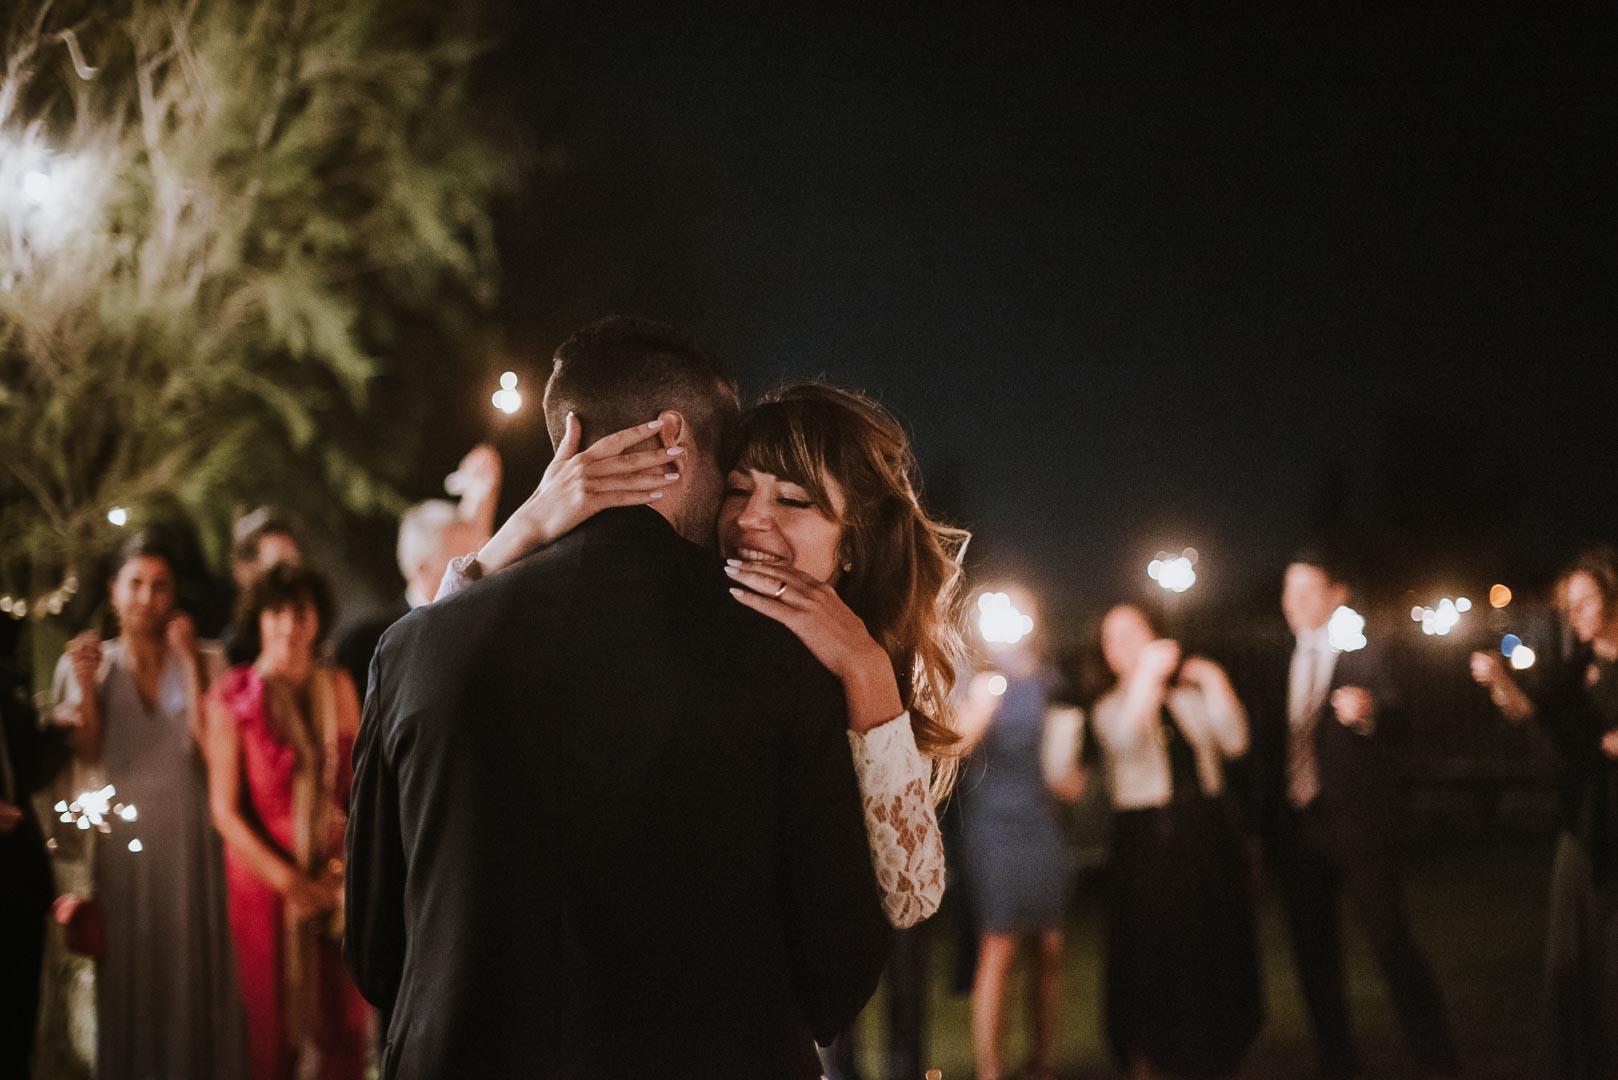 wedding-photographer-destination-fineart-bespoke-reportage-napoli-nabilah-vivianeizzo-spazio46-194